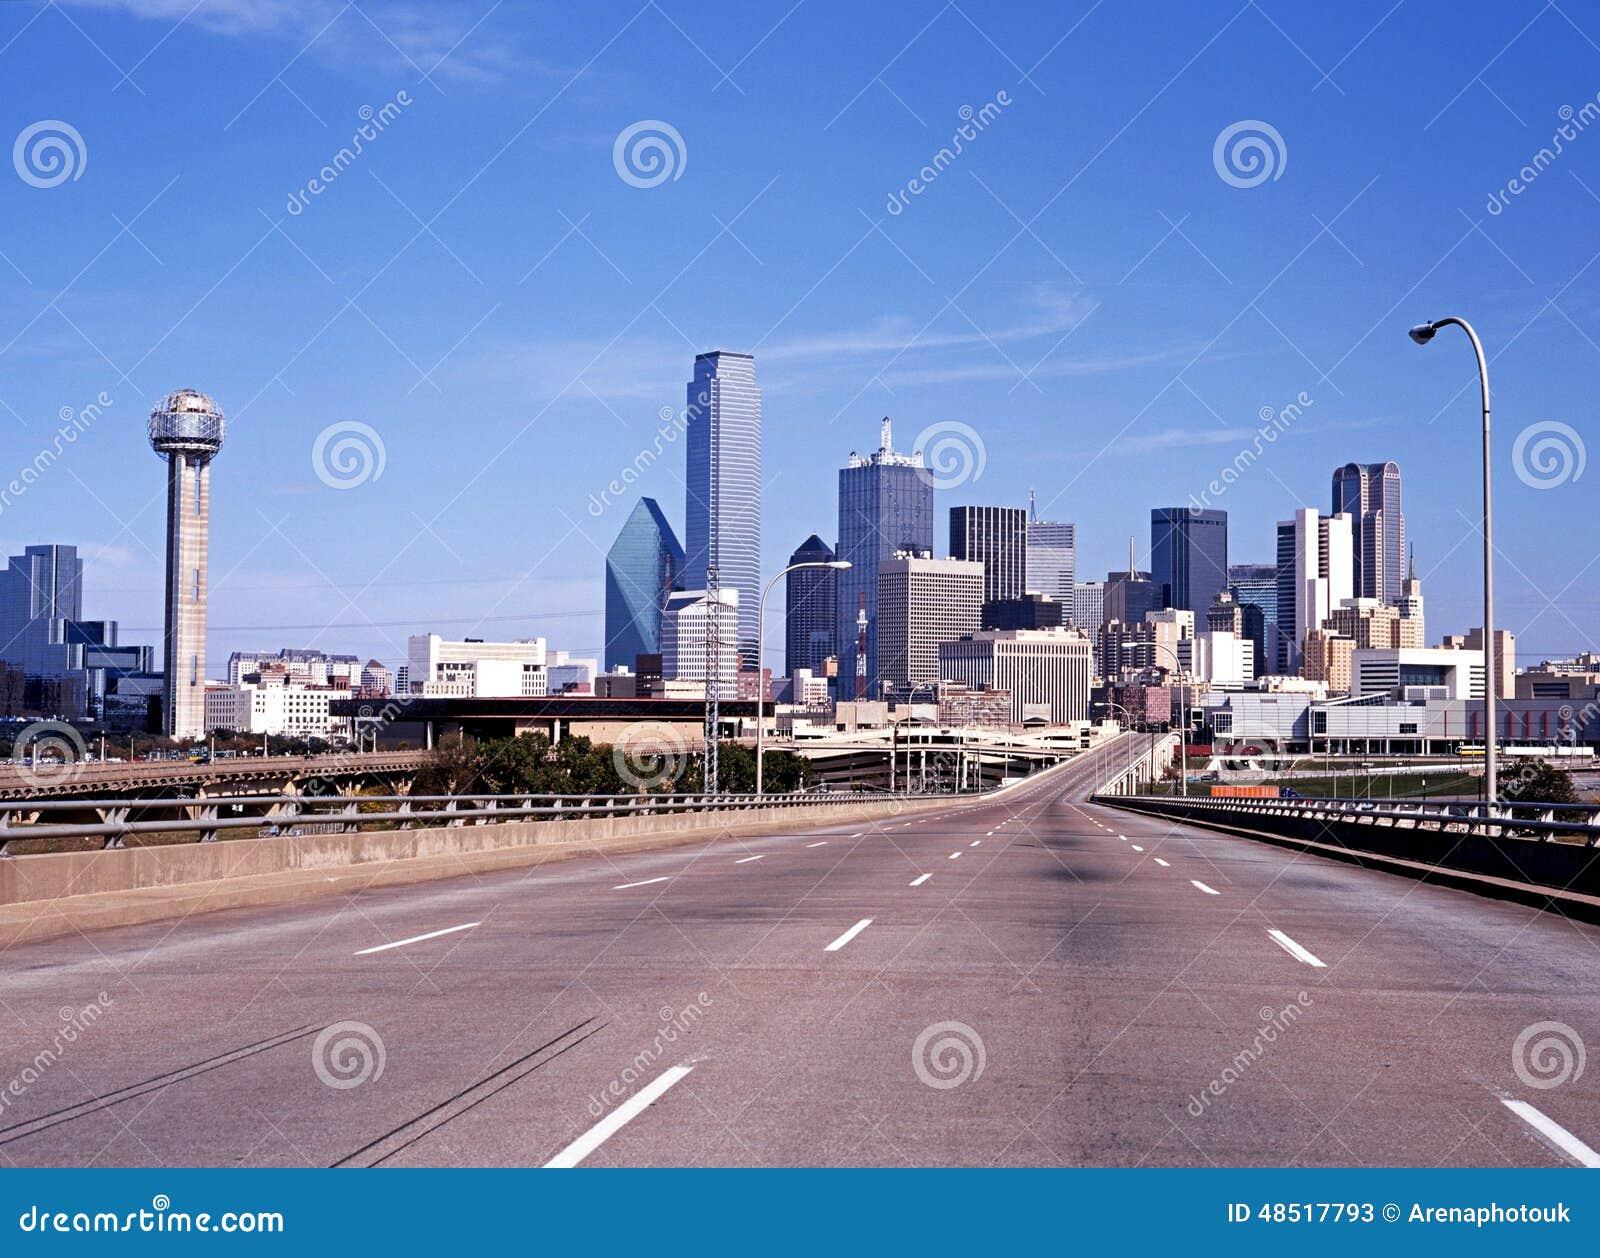 Dallas city skyline.